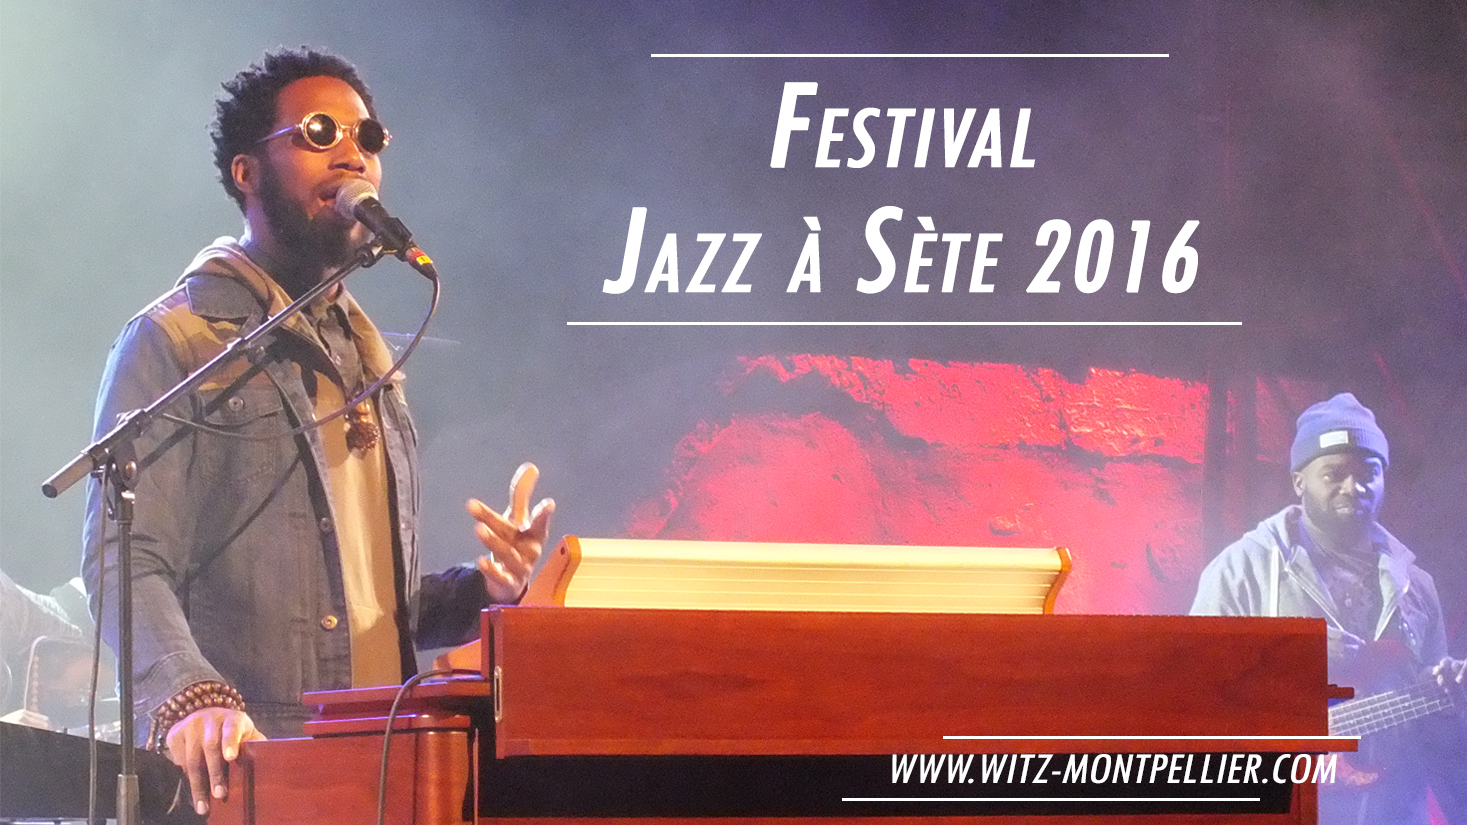 Festival Jazz à Sète 2016 : Cory Henry et Christian Scott